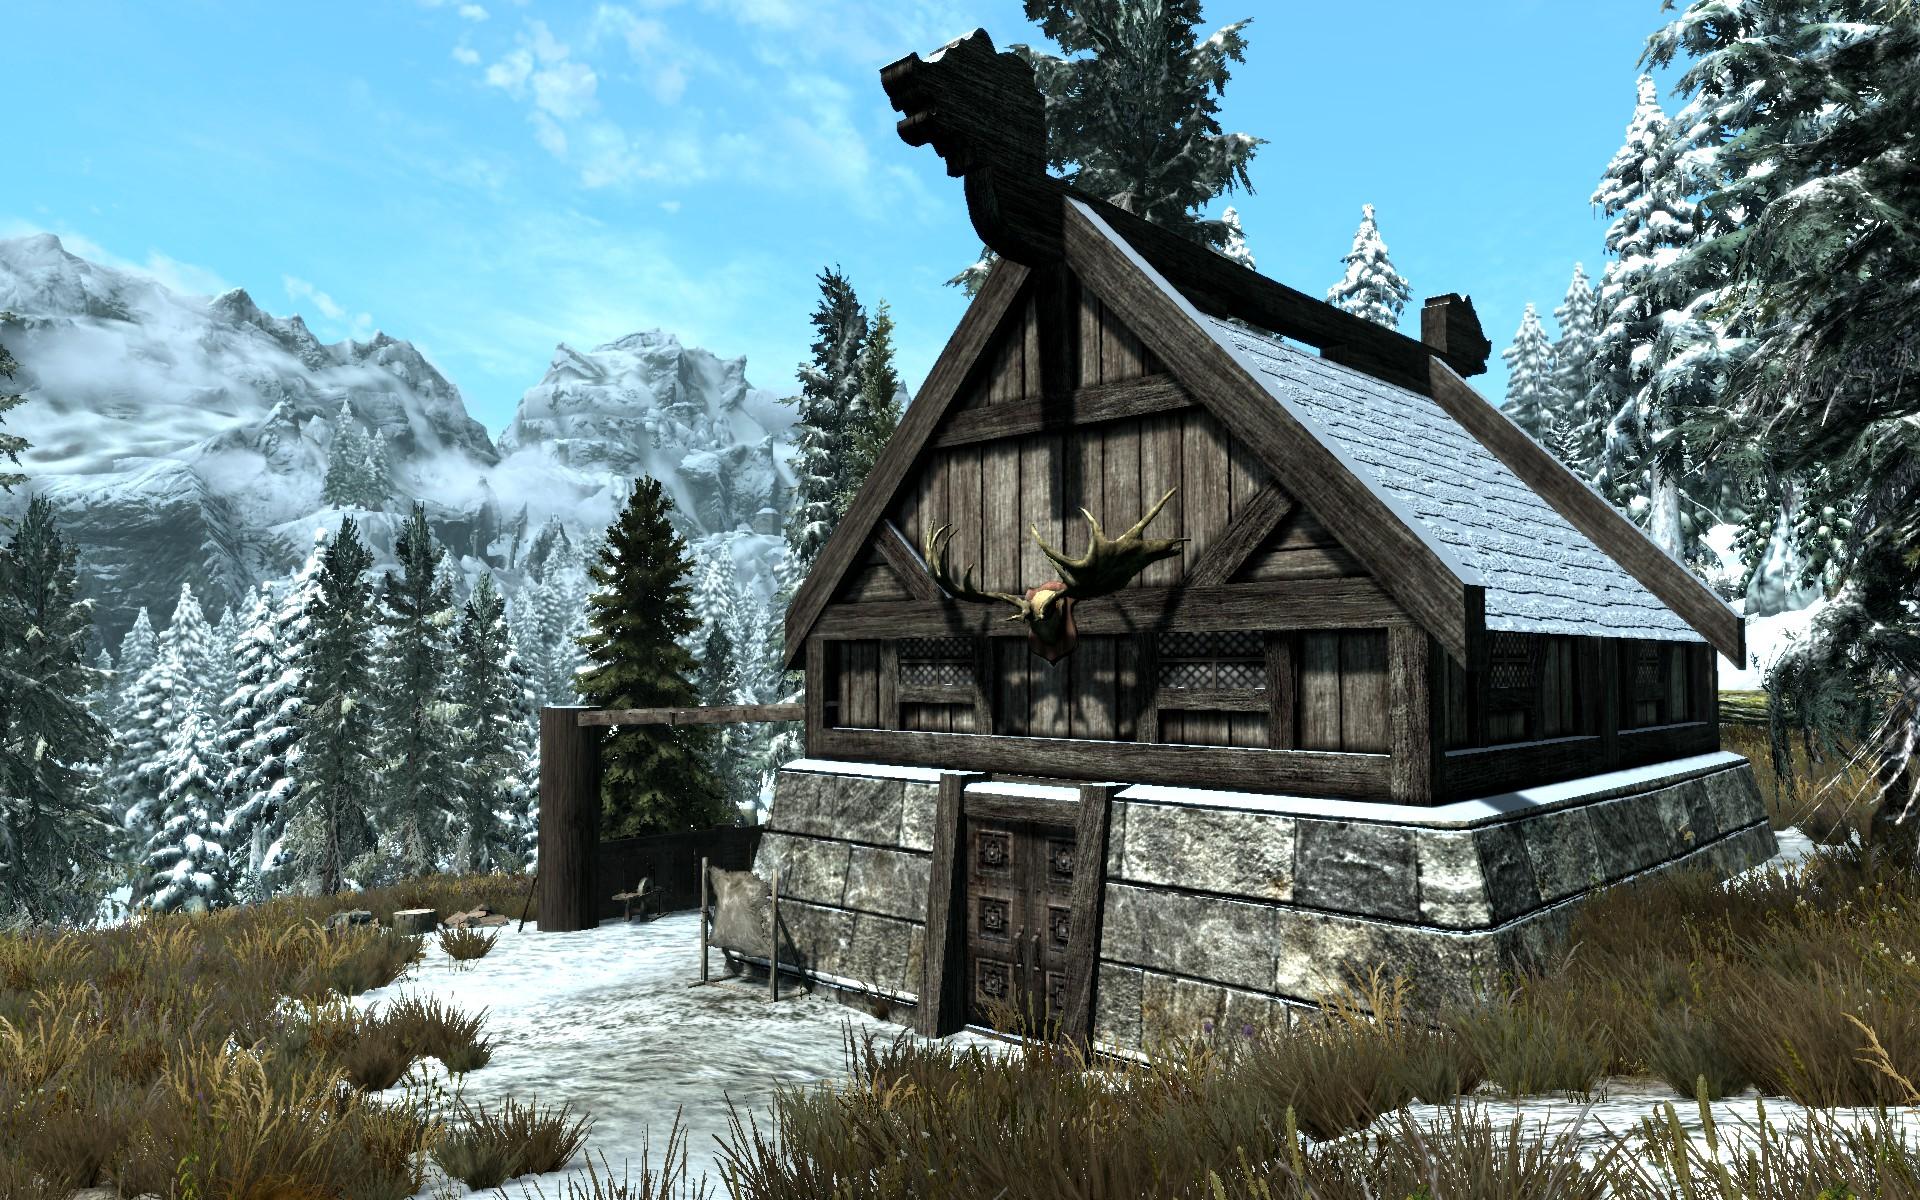 Warrior's Cabin